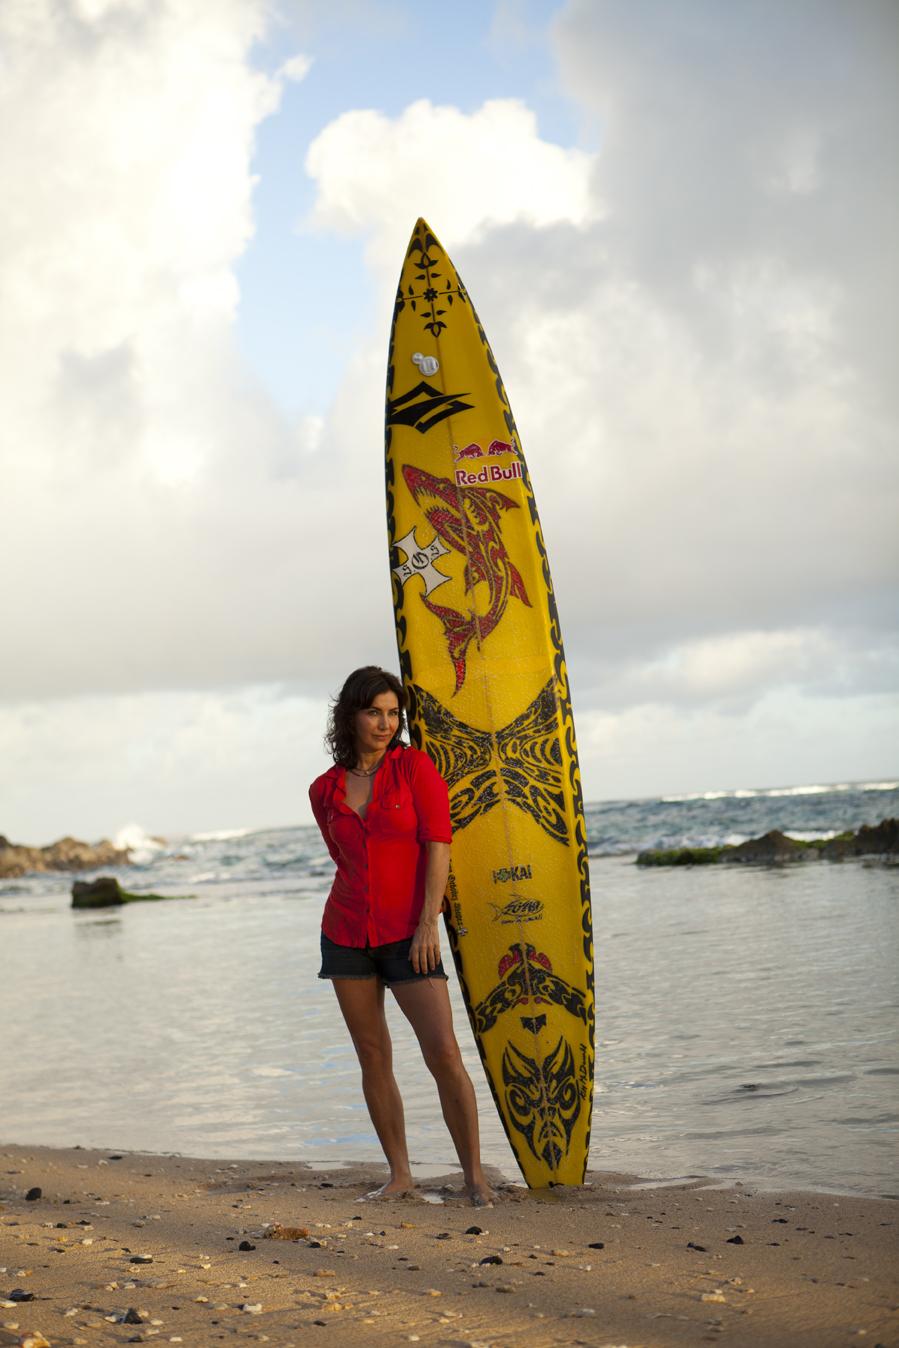 Kim McDonald surfboard for Kai Lenny, Kuau, Maui